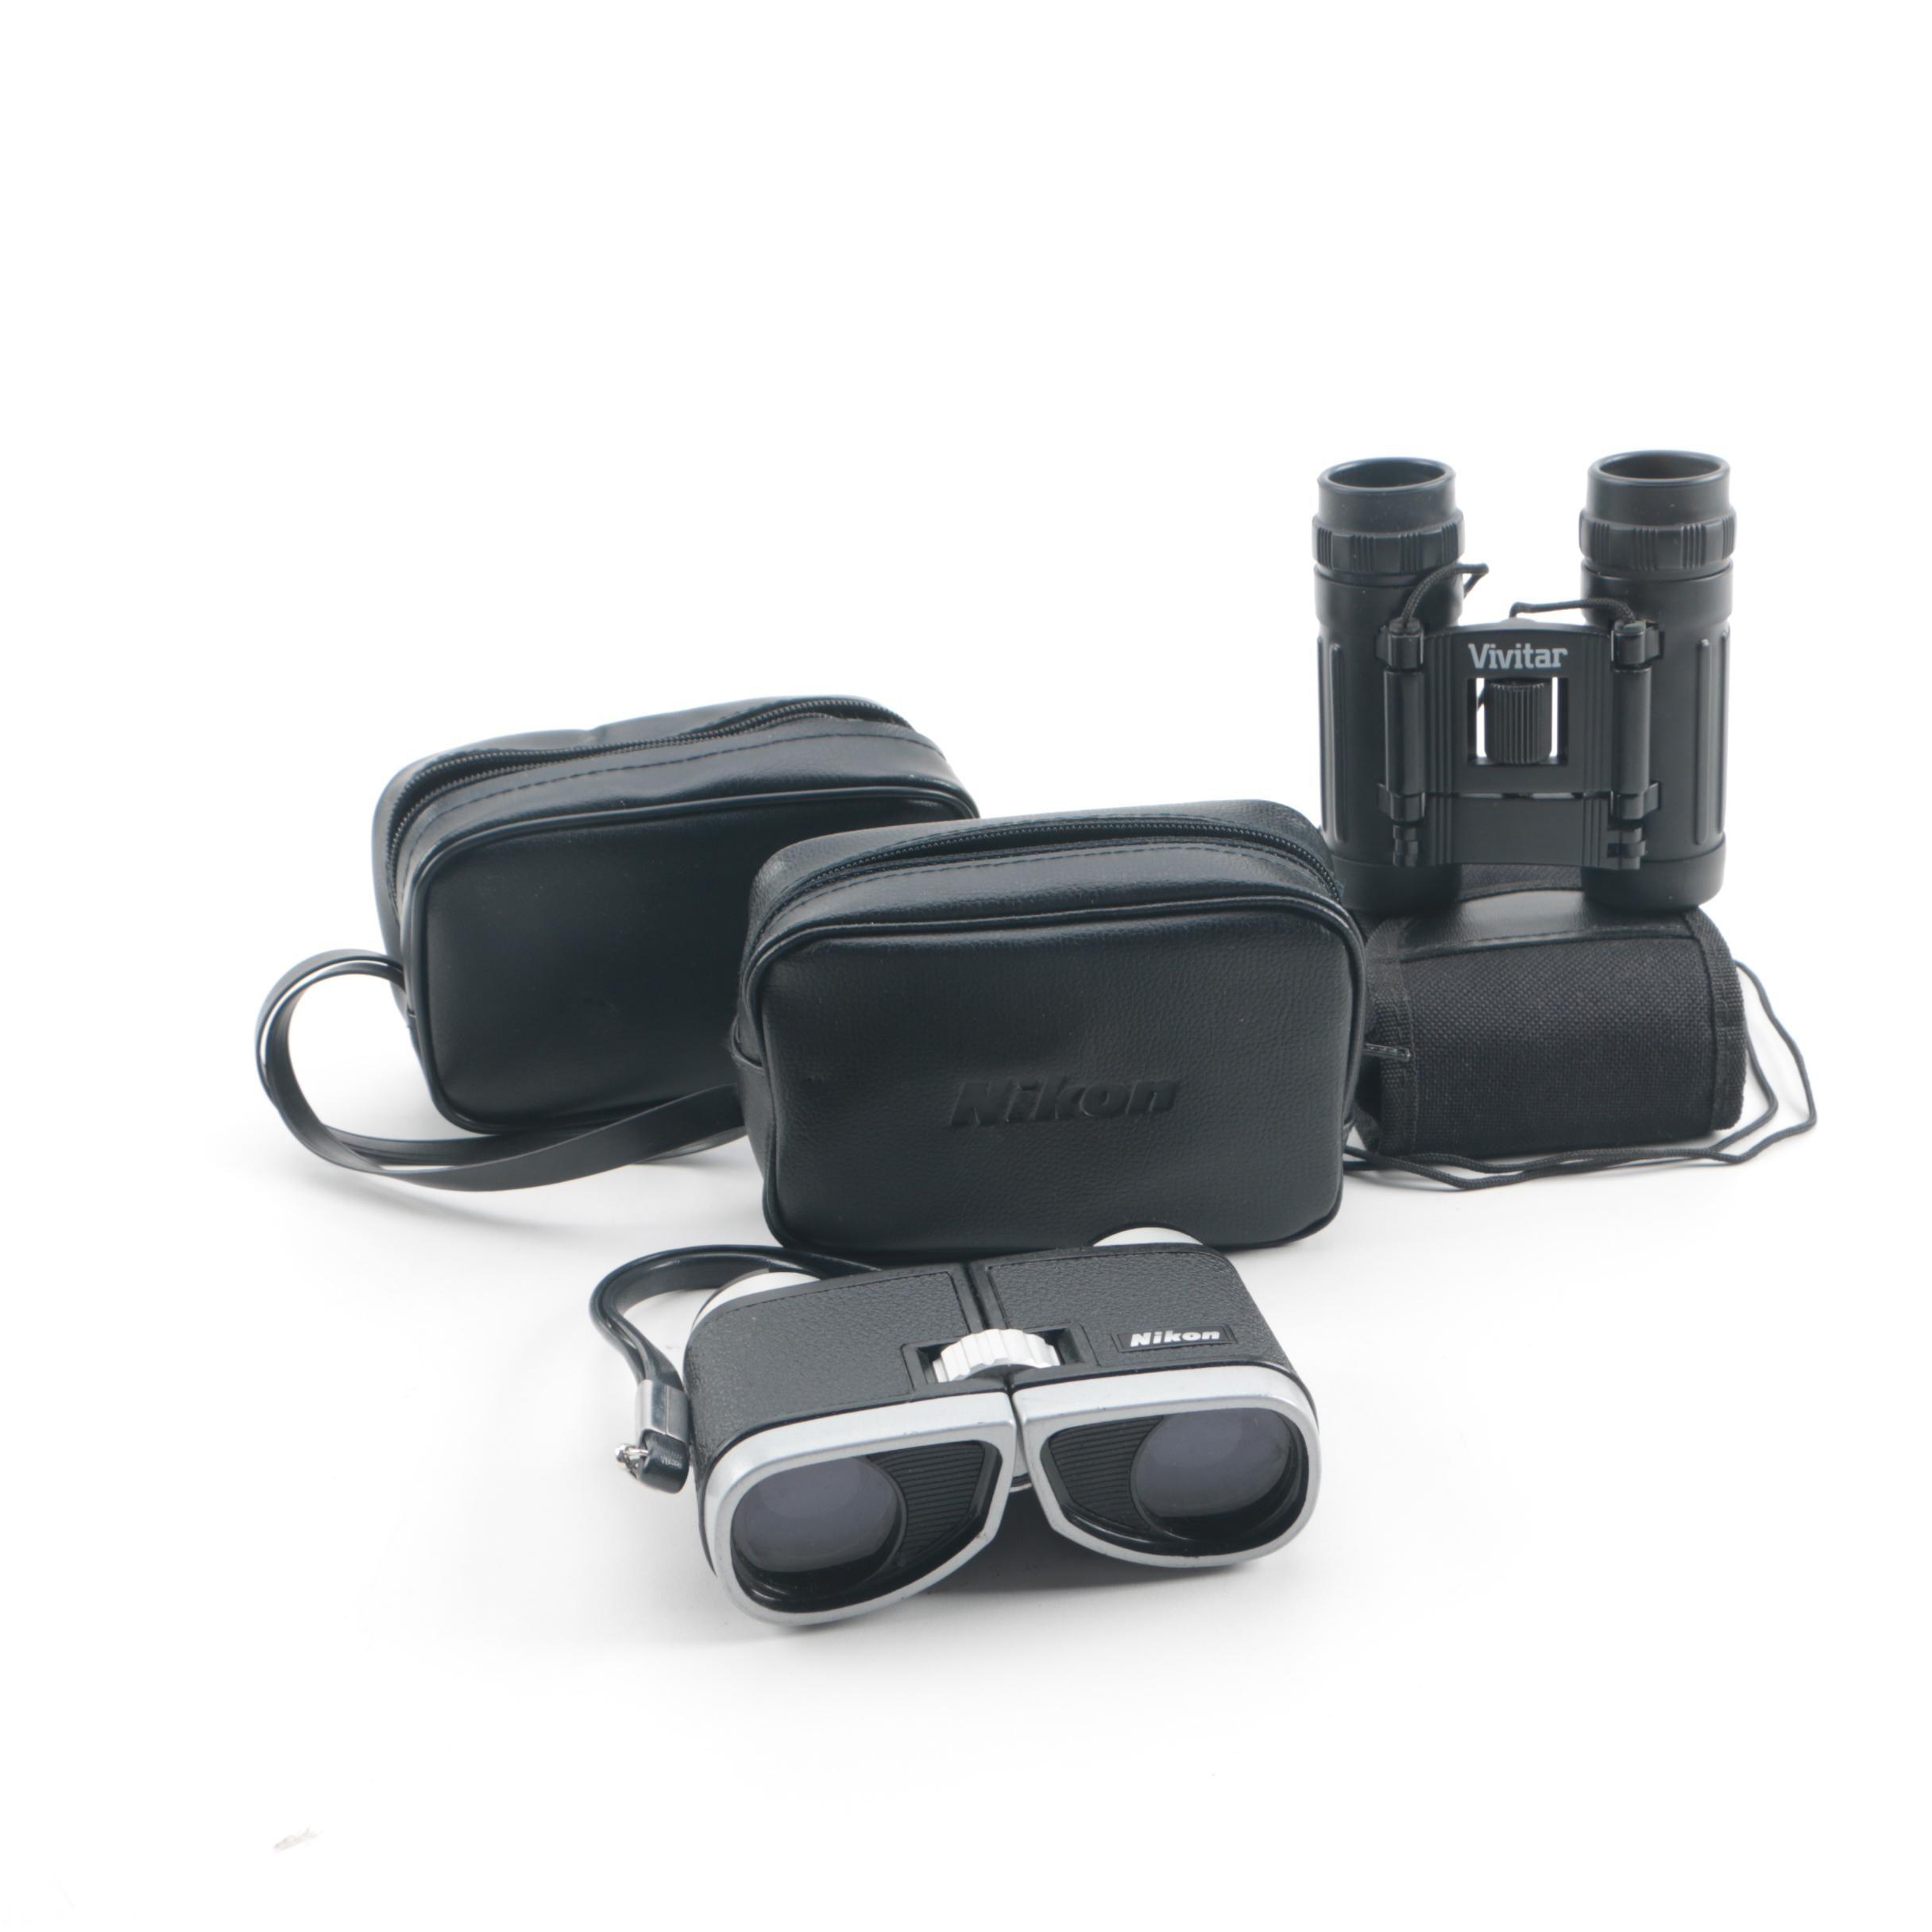 Vivitar, Nikon and Western Field Binoculars With Cases